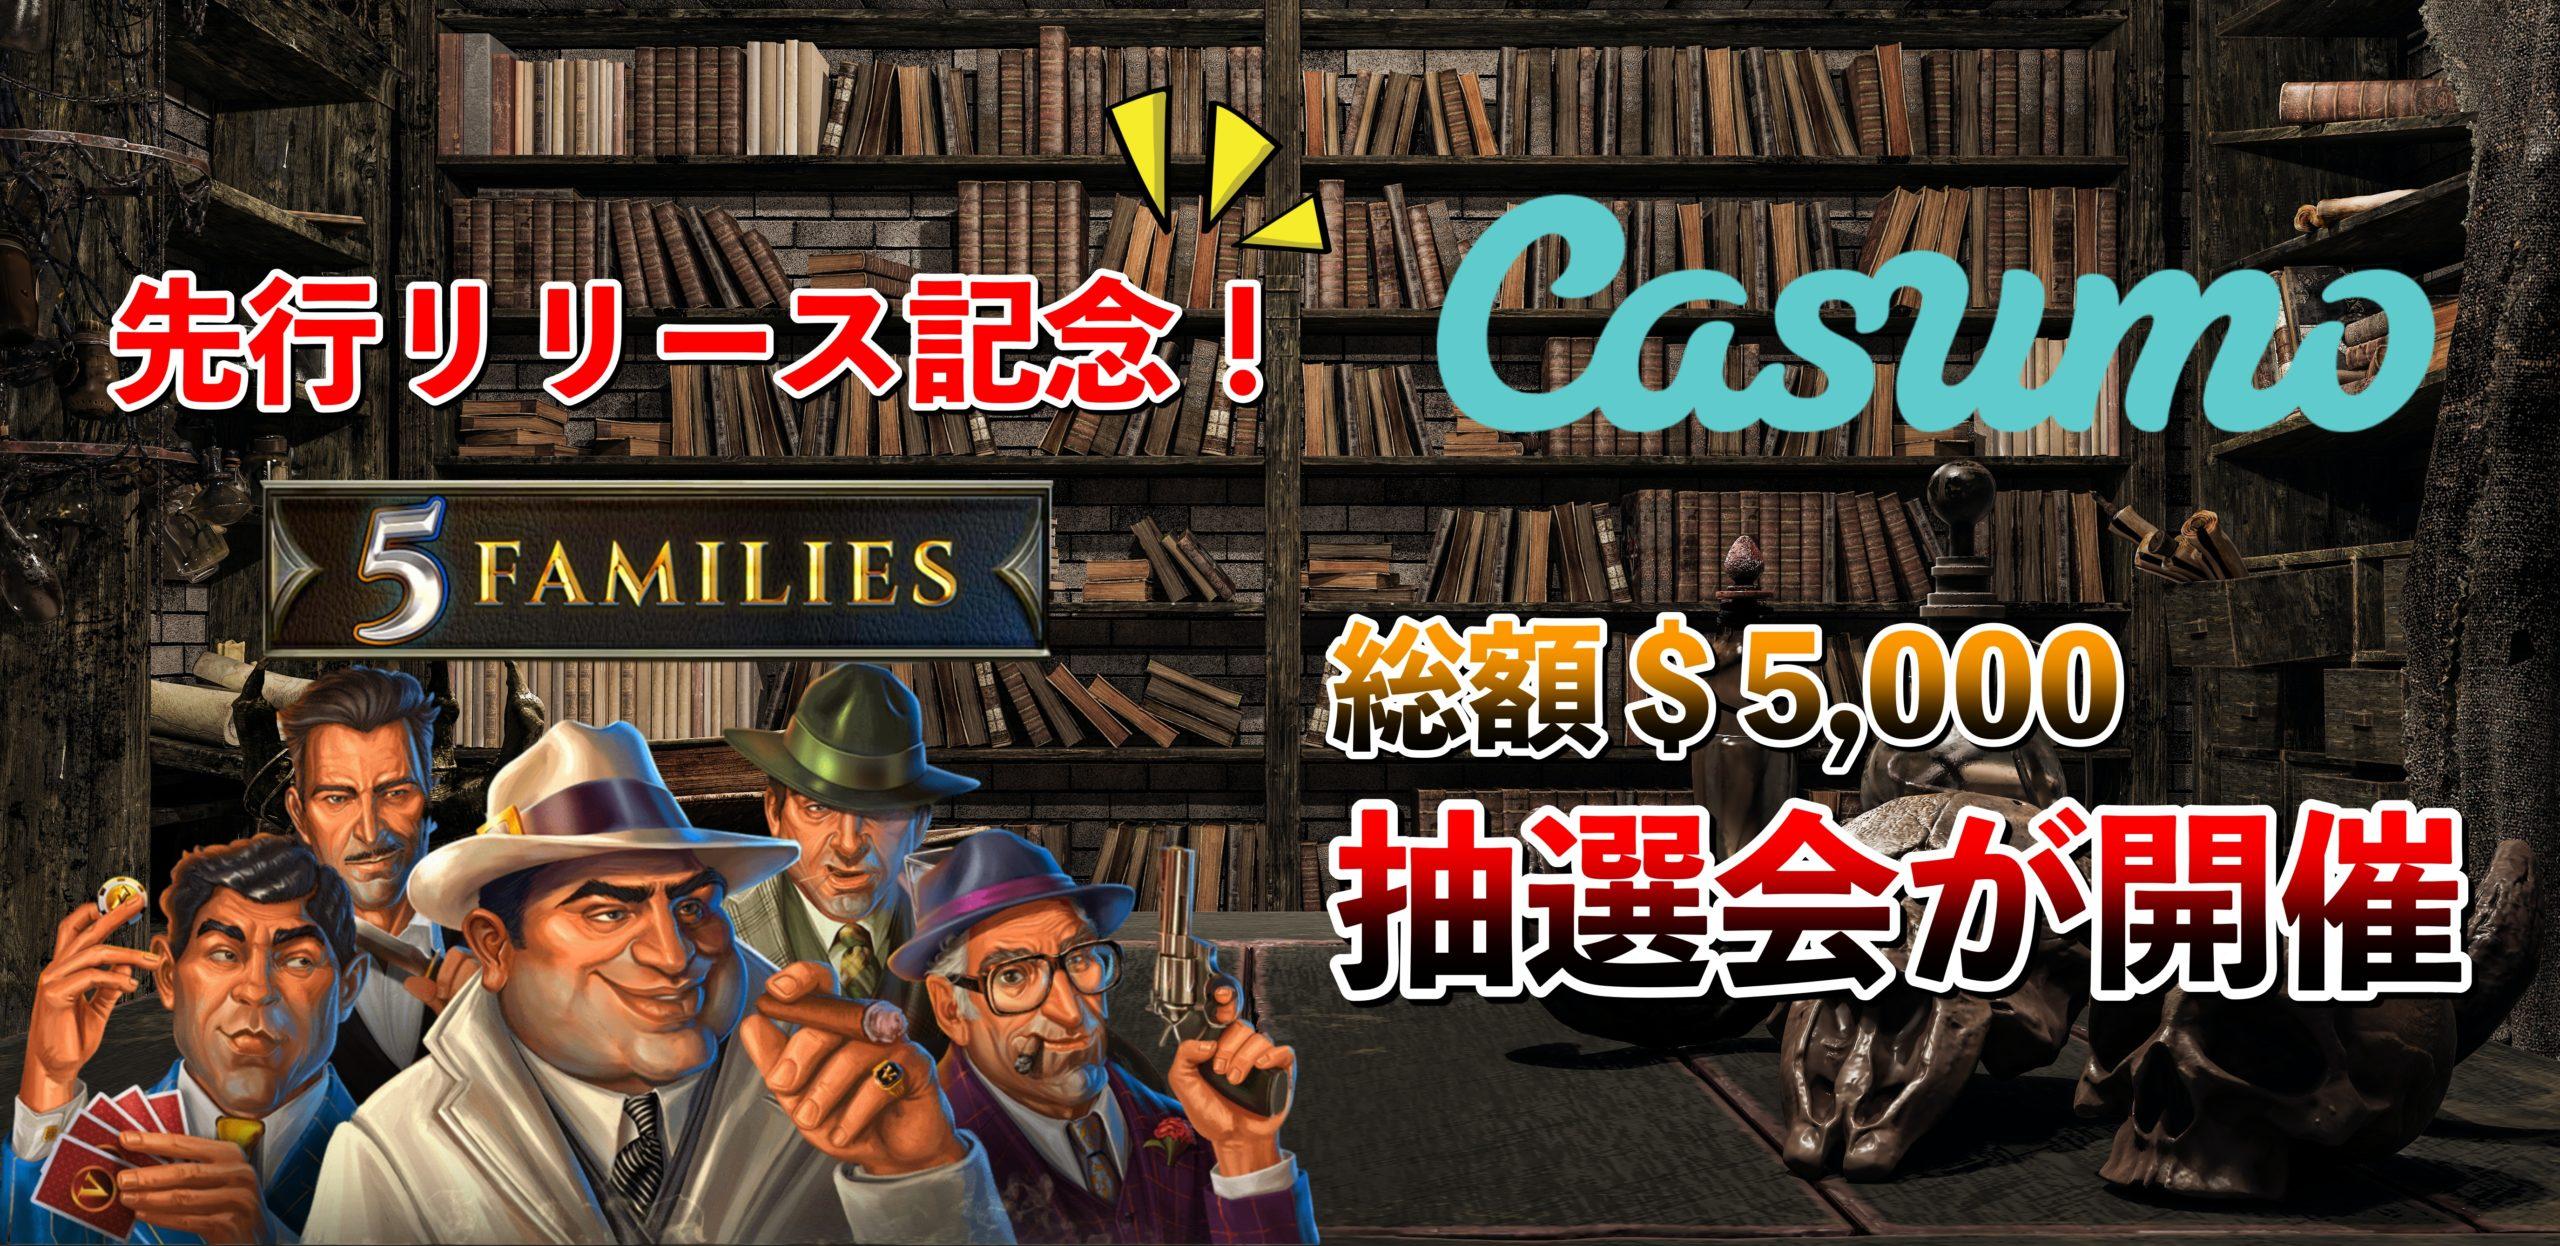 Casumoで「5 Families」独占先行リリース記念|5日間連日抽選会が開催!